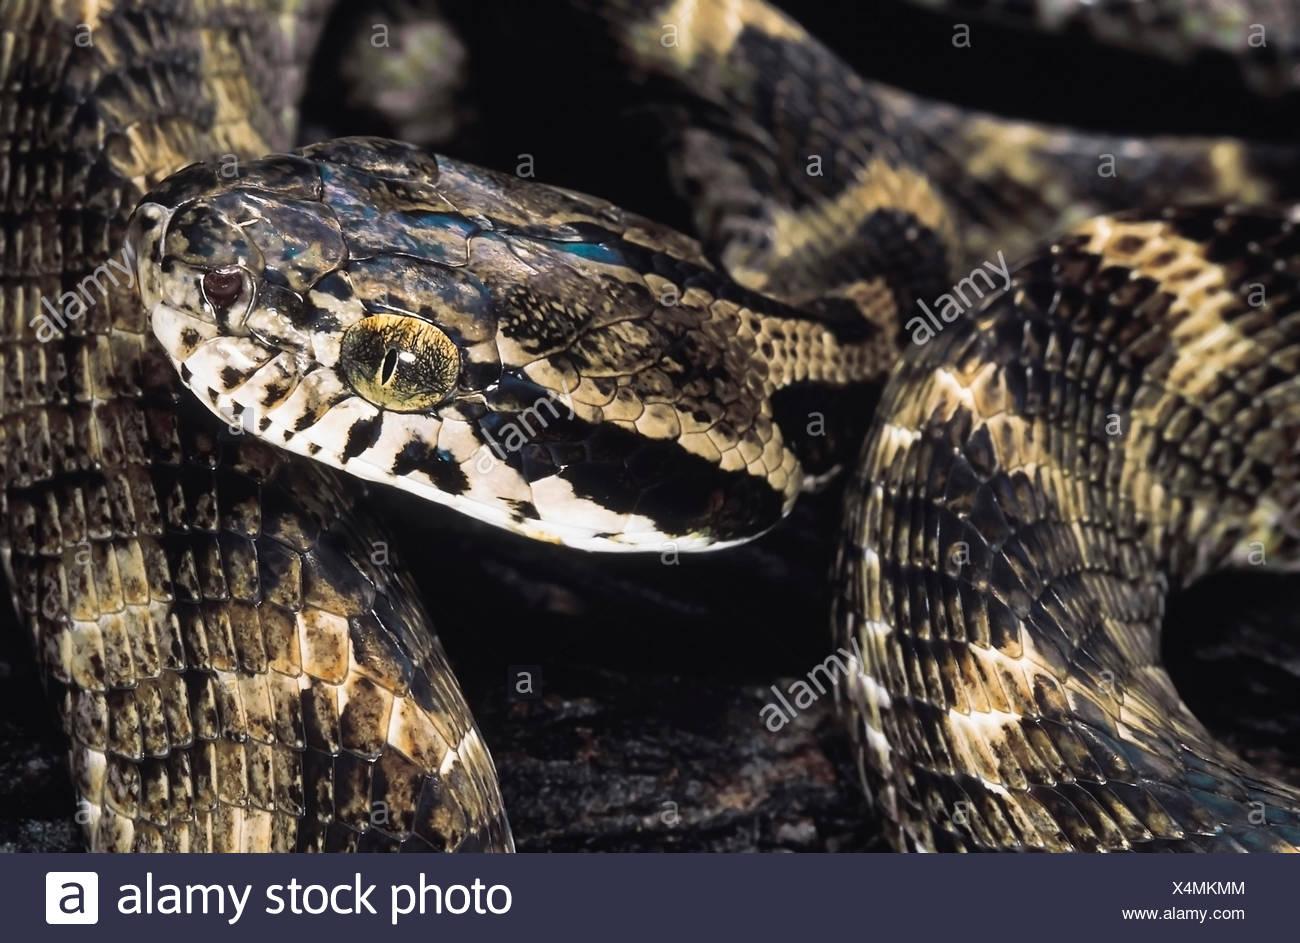 Boiga Forsteni. Forsten die Katze Schlange. Nicht giftig. Maharashtra, Indien. Stockbild